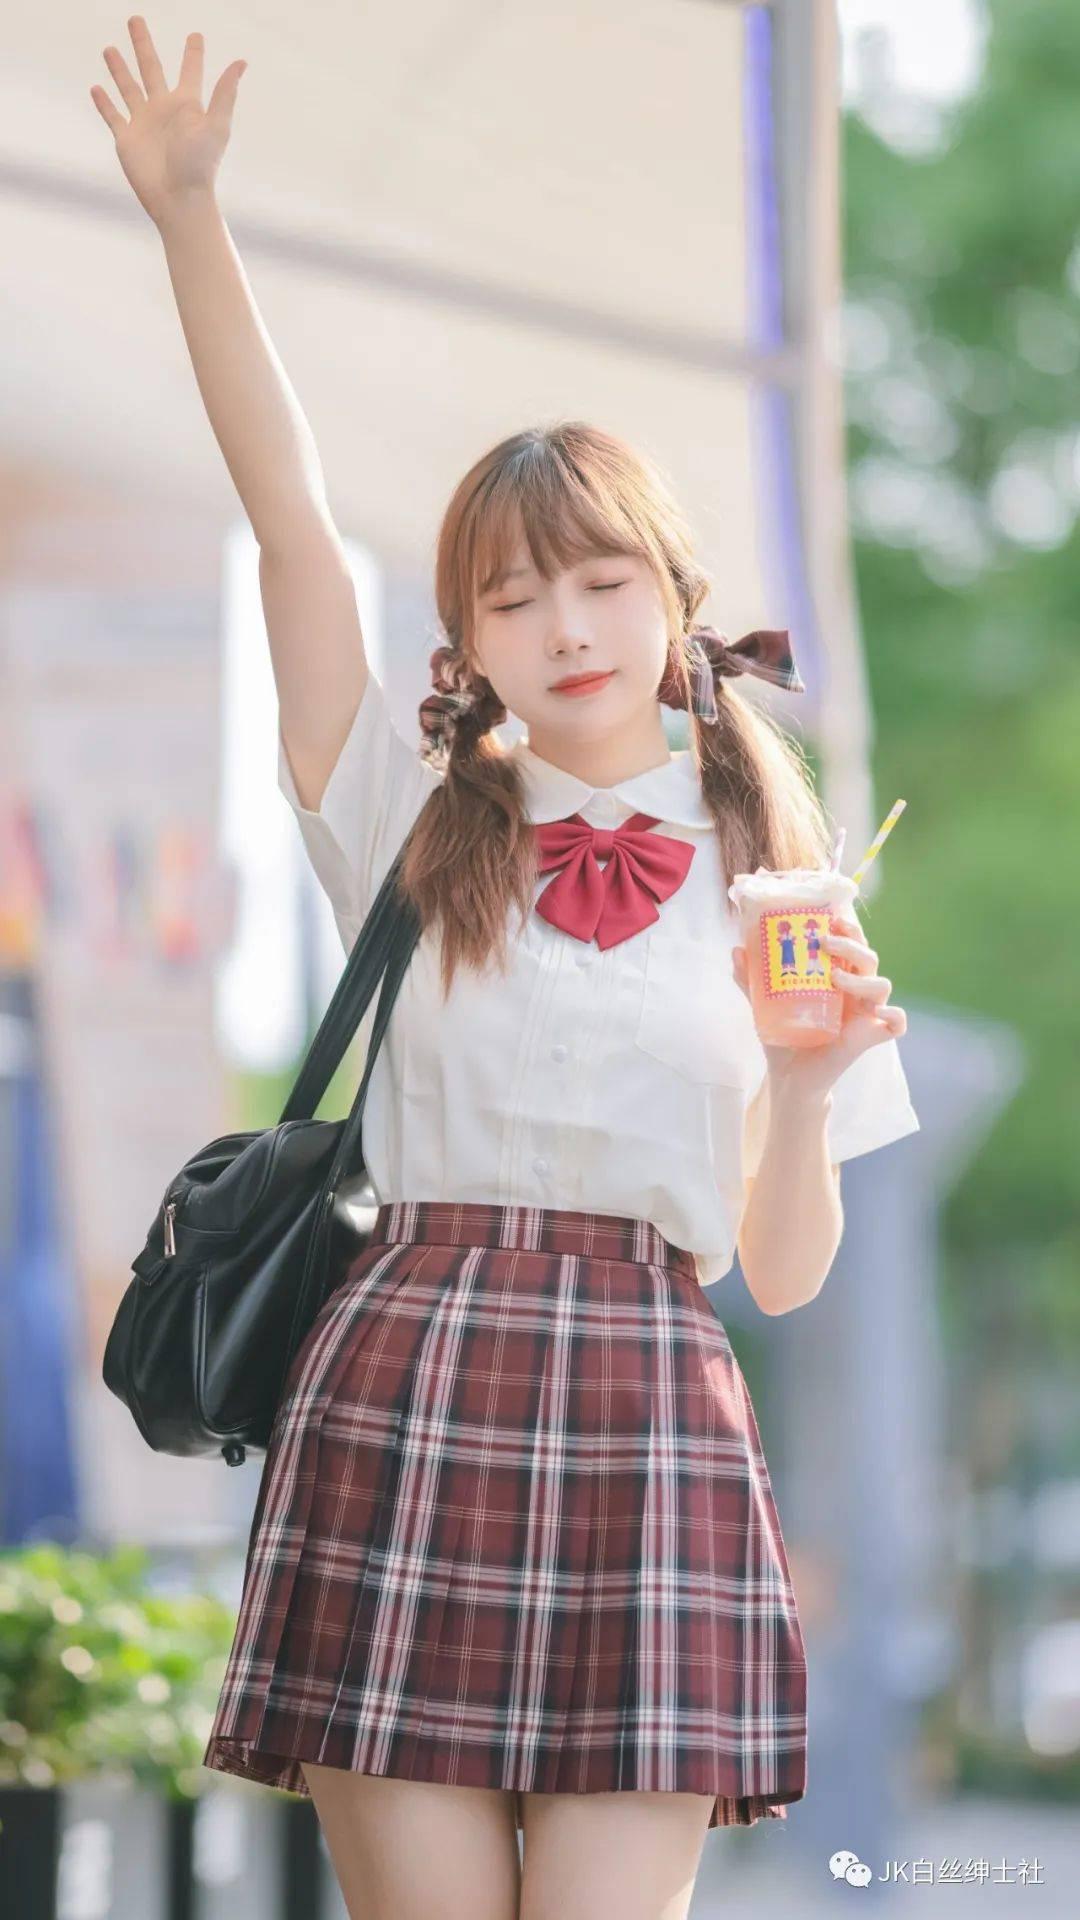 JK少女:夏日限定爱